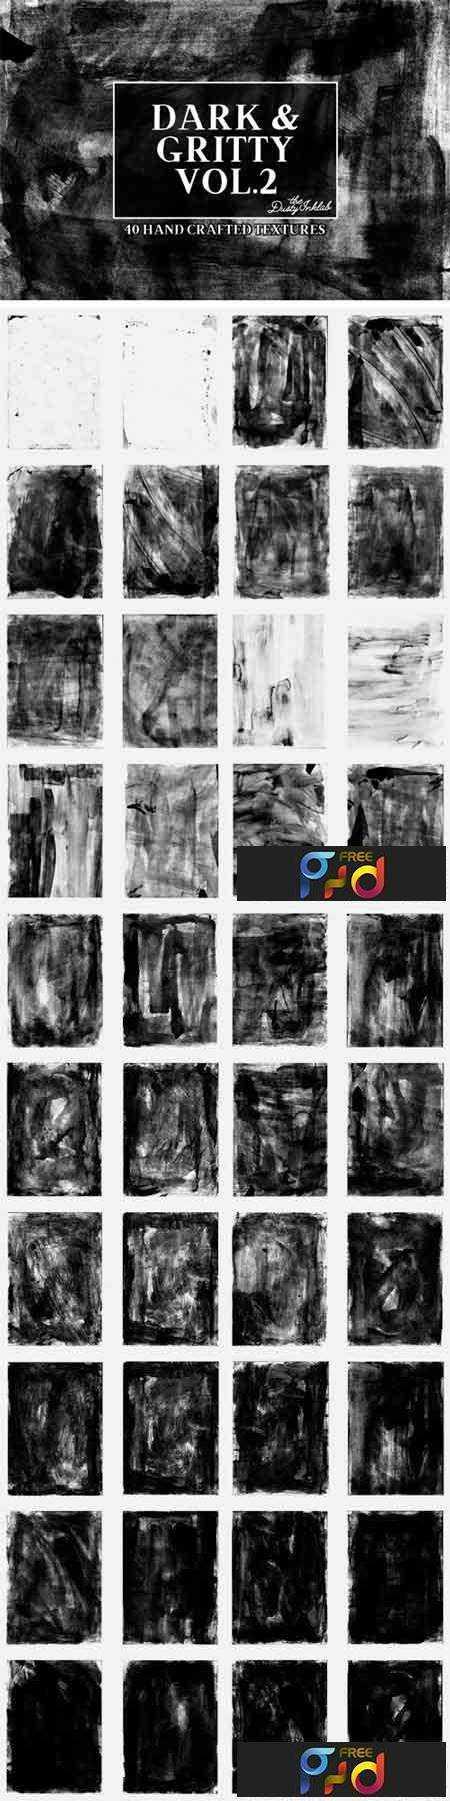 1707172 Dark & Gritty Vol. 2 1952975 1